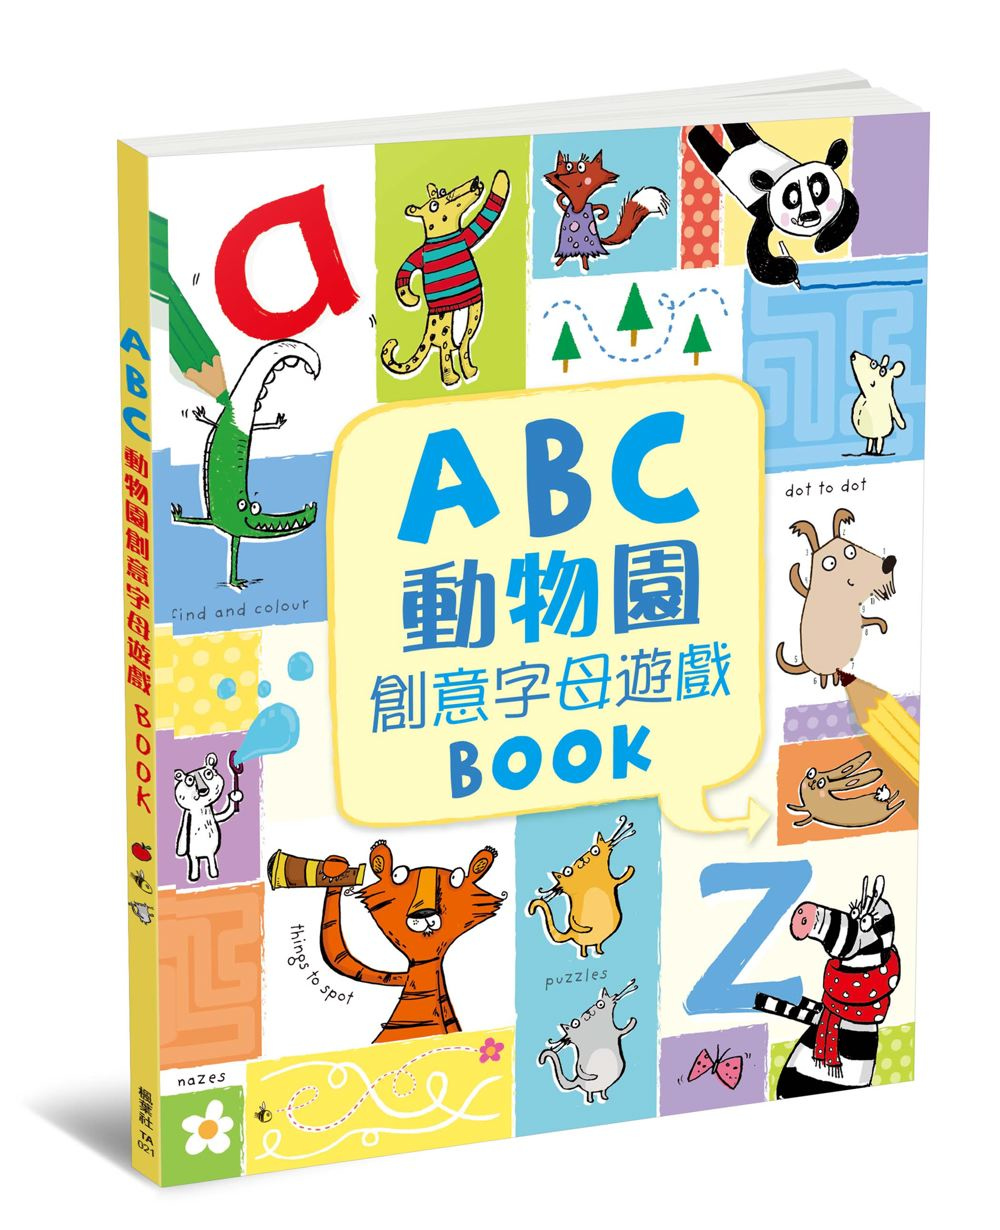 ABC動物園 創意字母遊戲BOOK